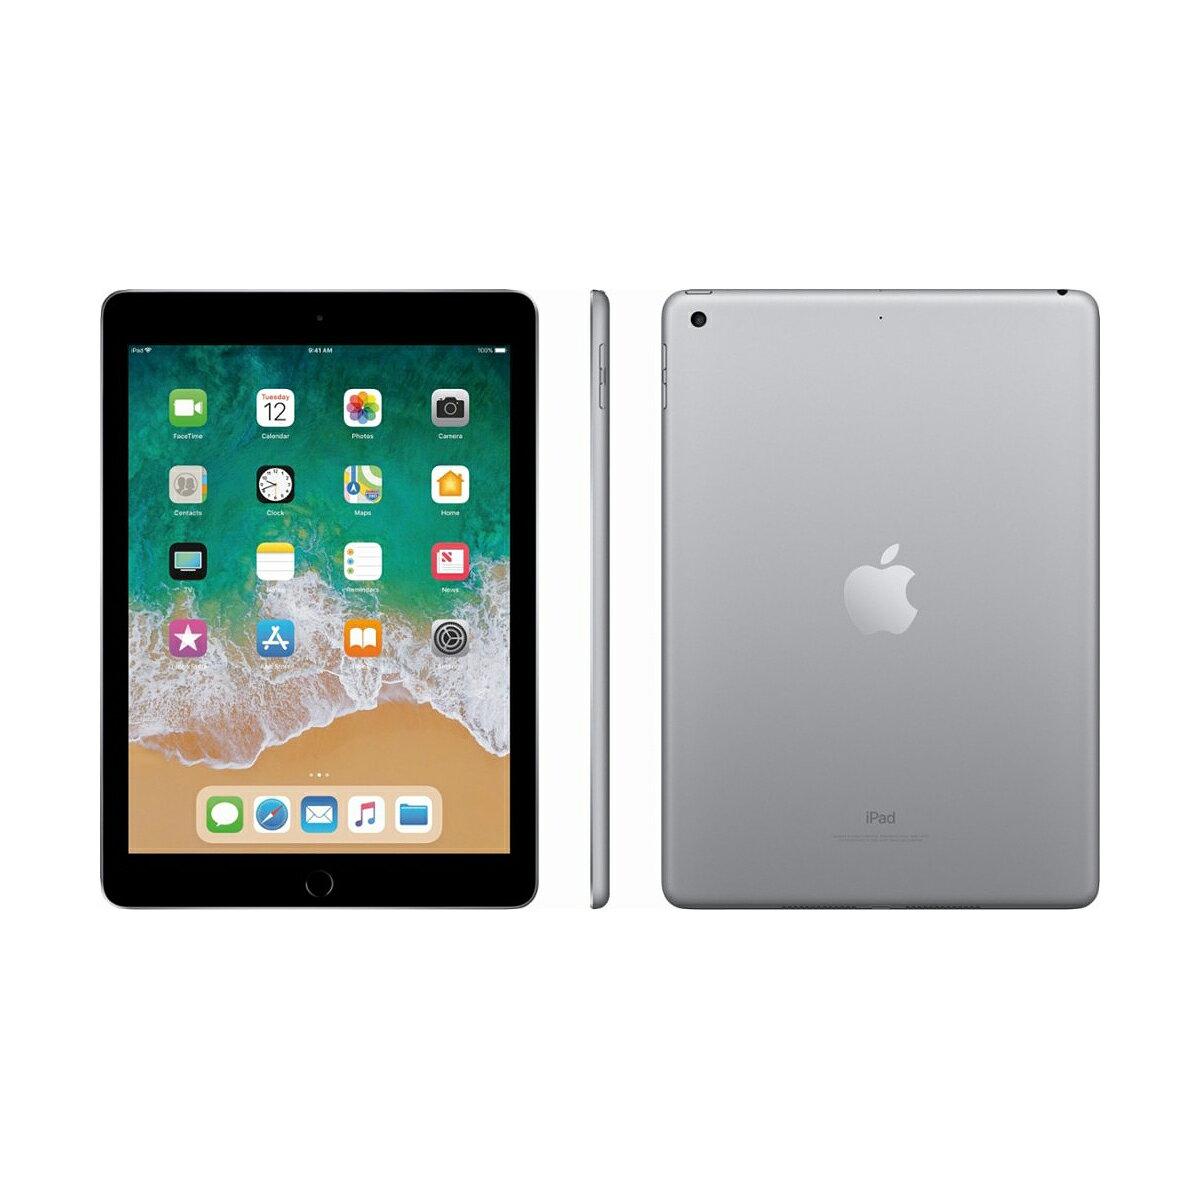 "Apple iPad 9.7"" Retina Display 32GB Wi-Fi Multi-Touch Tablet 5th Gen MP2F2LLA - Space Gray 2"